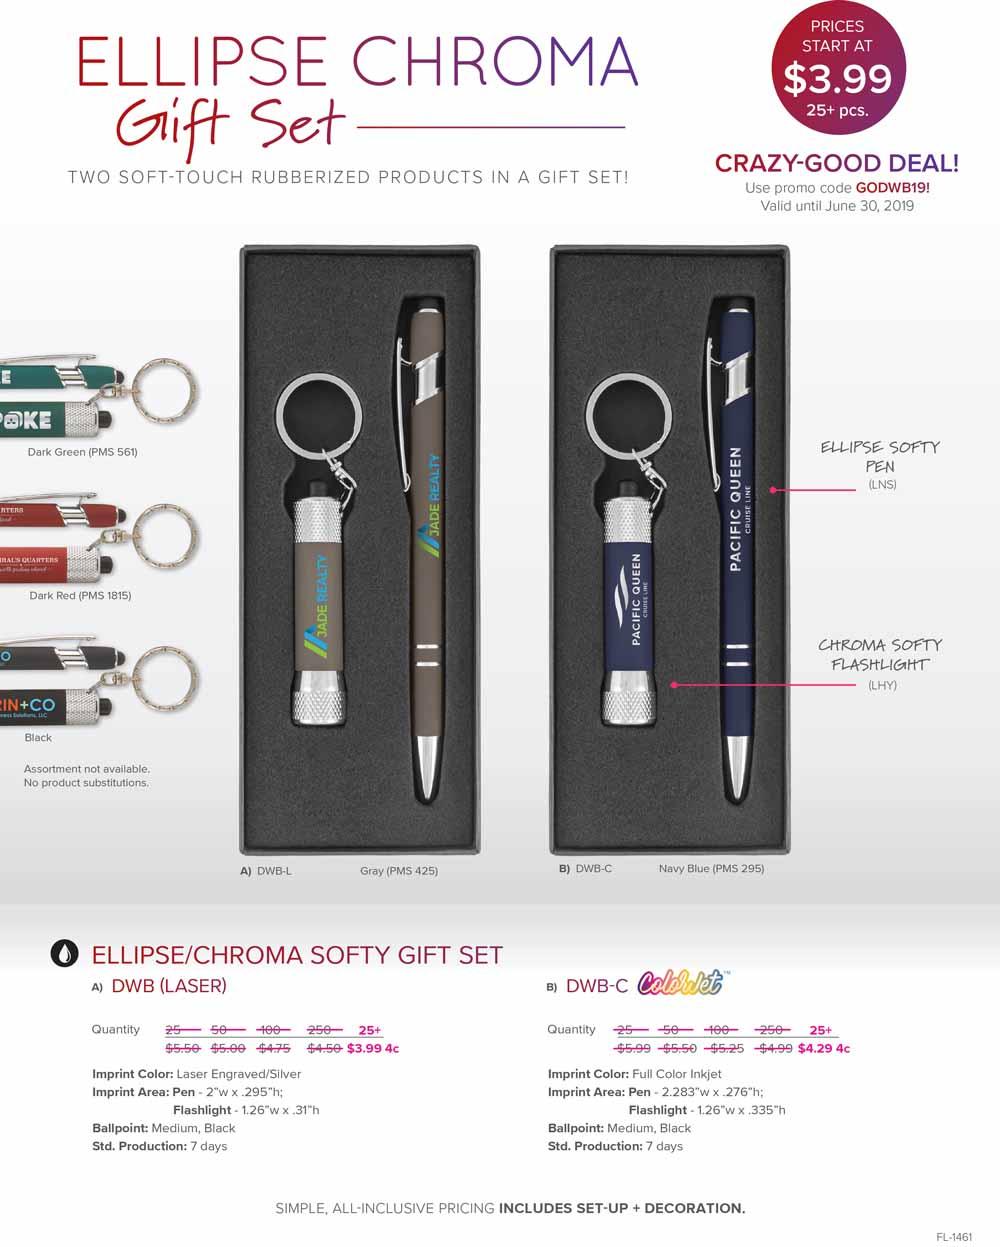 Crazy-Good Deal - Ellipse & Chroma Gift Set